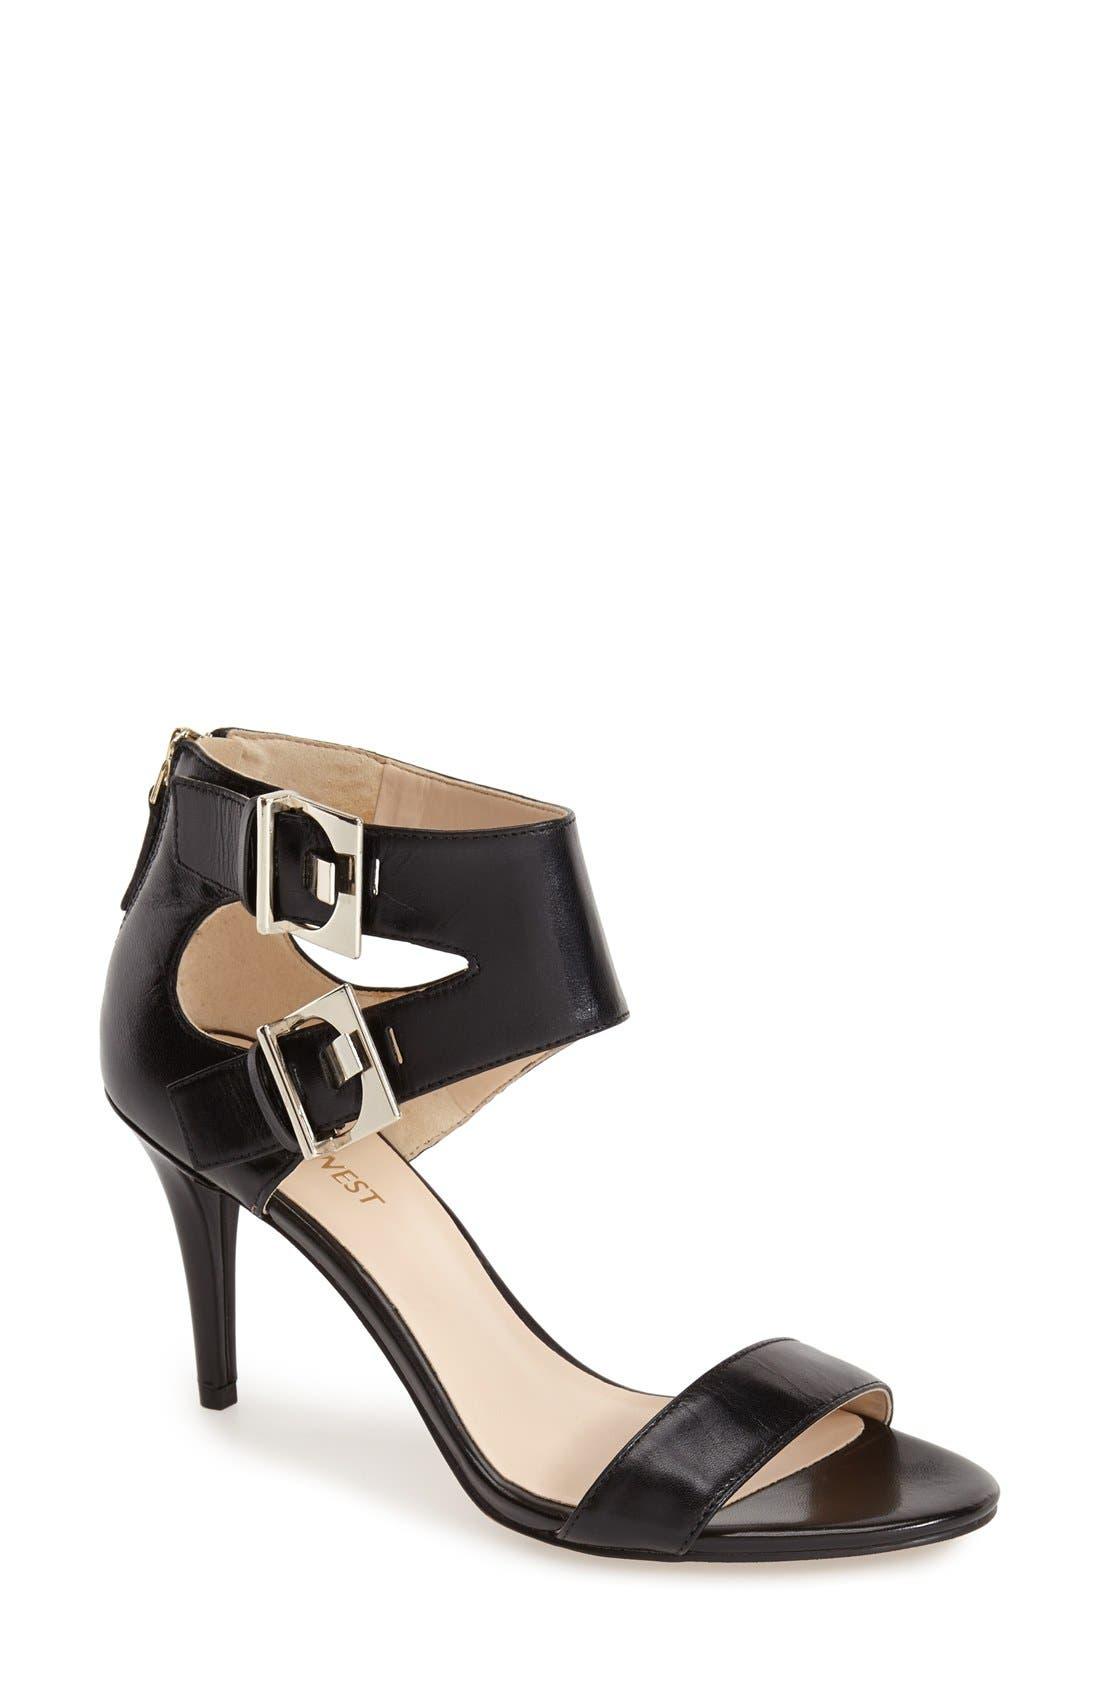 Main Image - Nine West 'Intwyne' Sandal (Women)